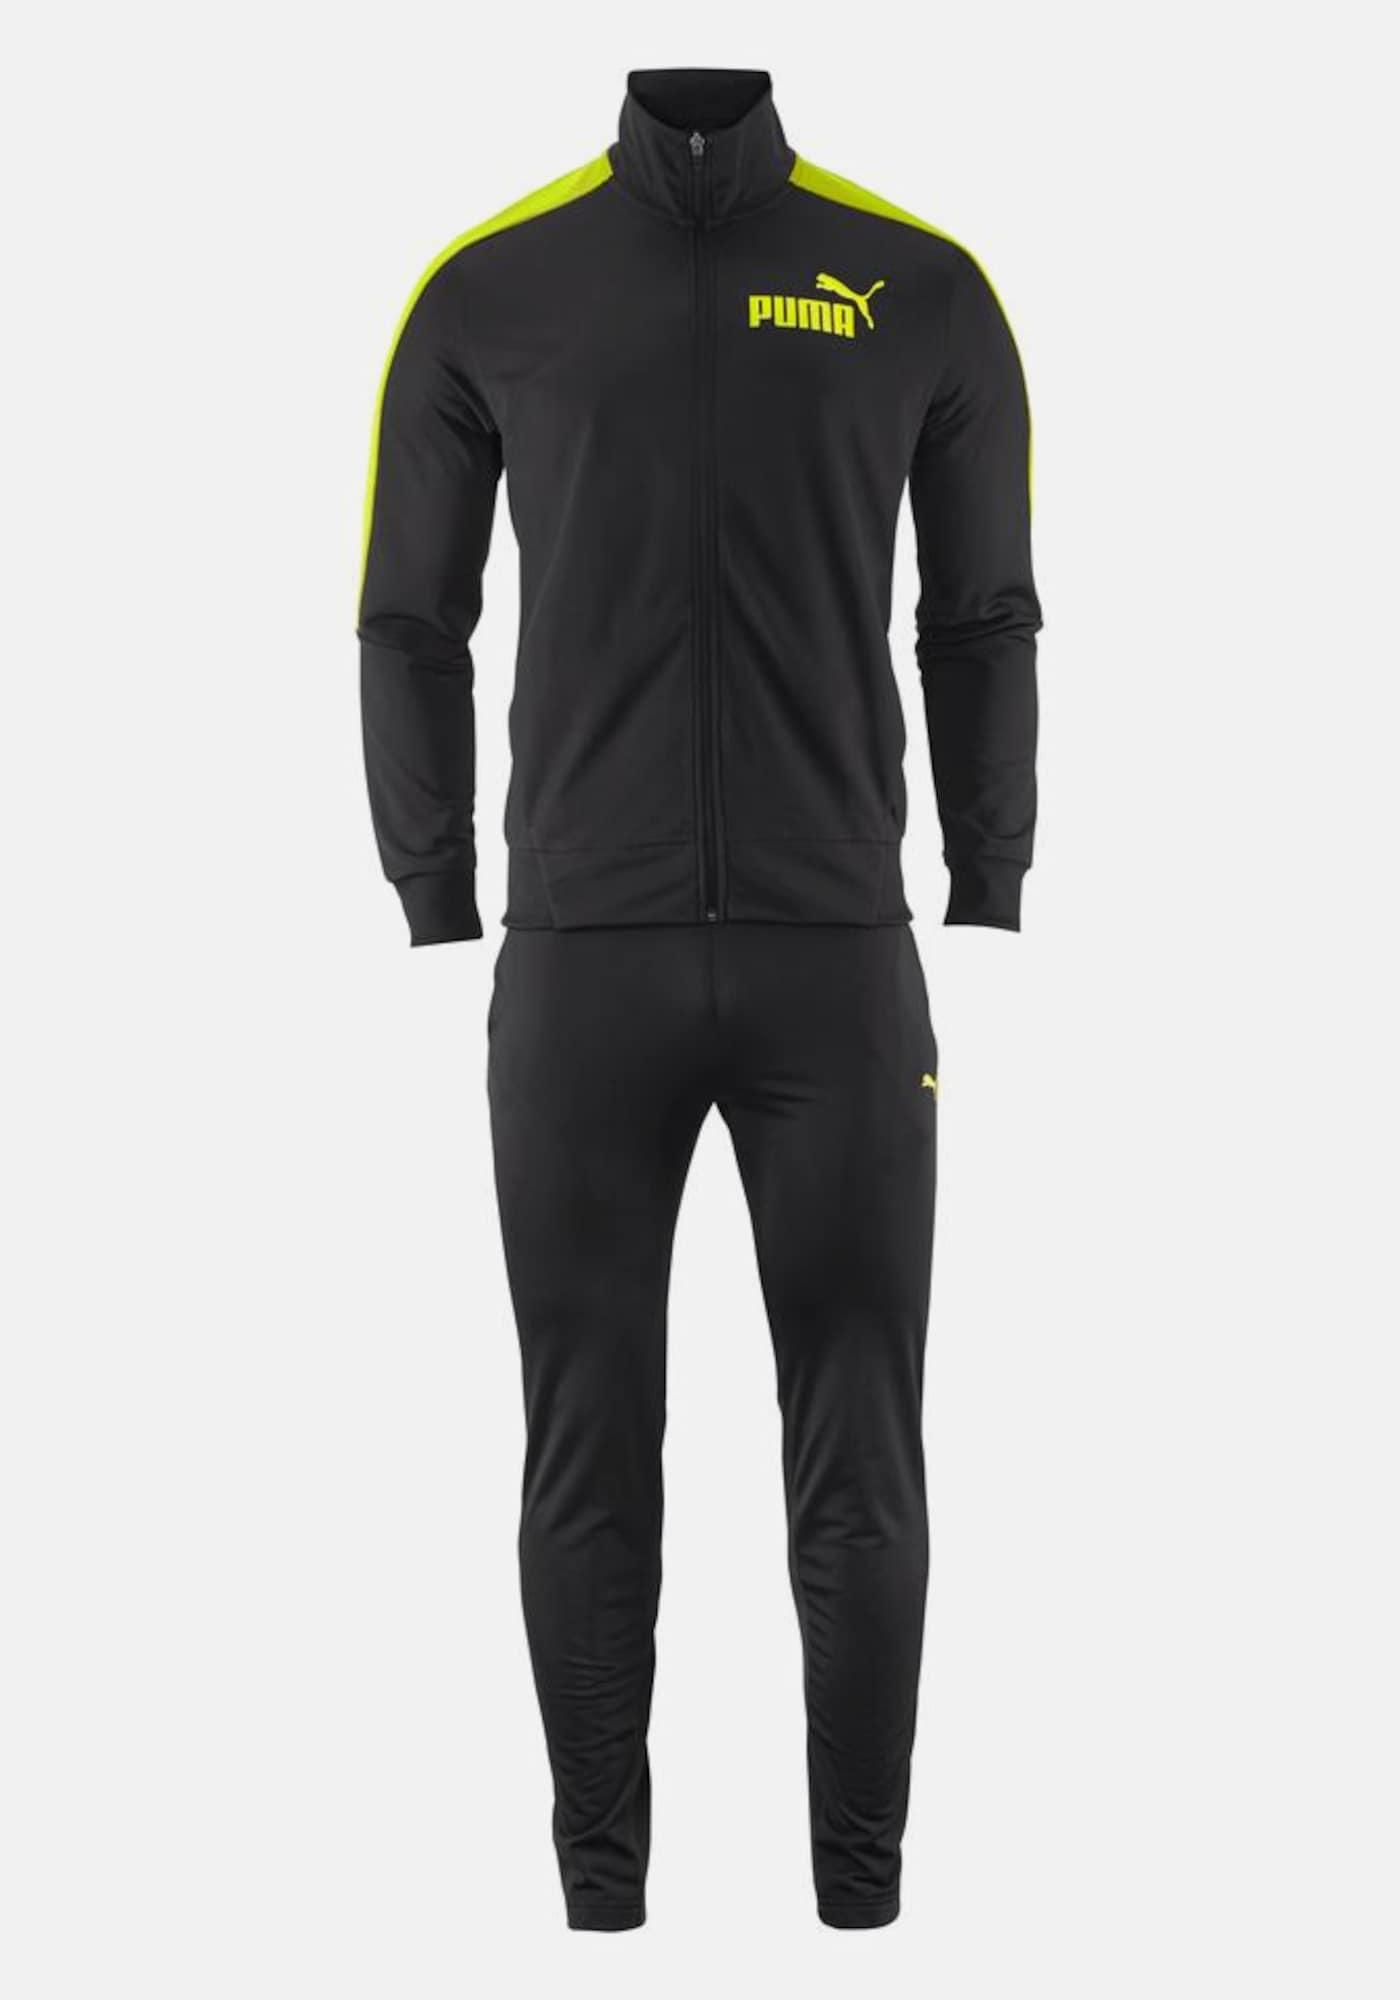 puma trainingsanzug 39 tricot suite 39 in schwarz about you. Black Bedroom Furniture Sets. Home Design Ideas